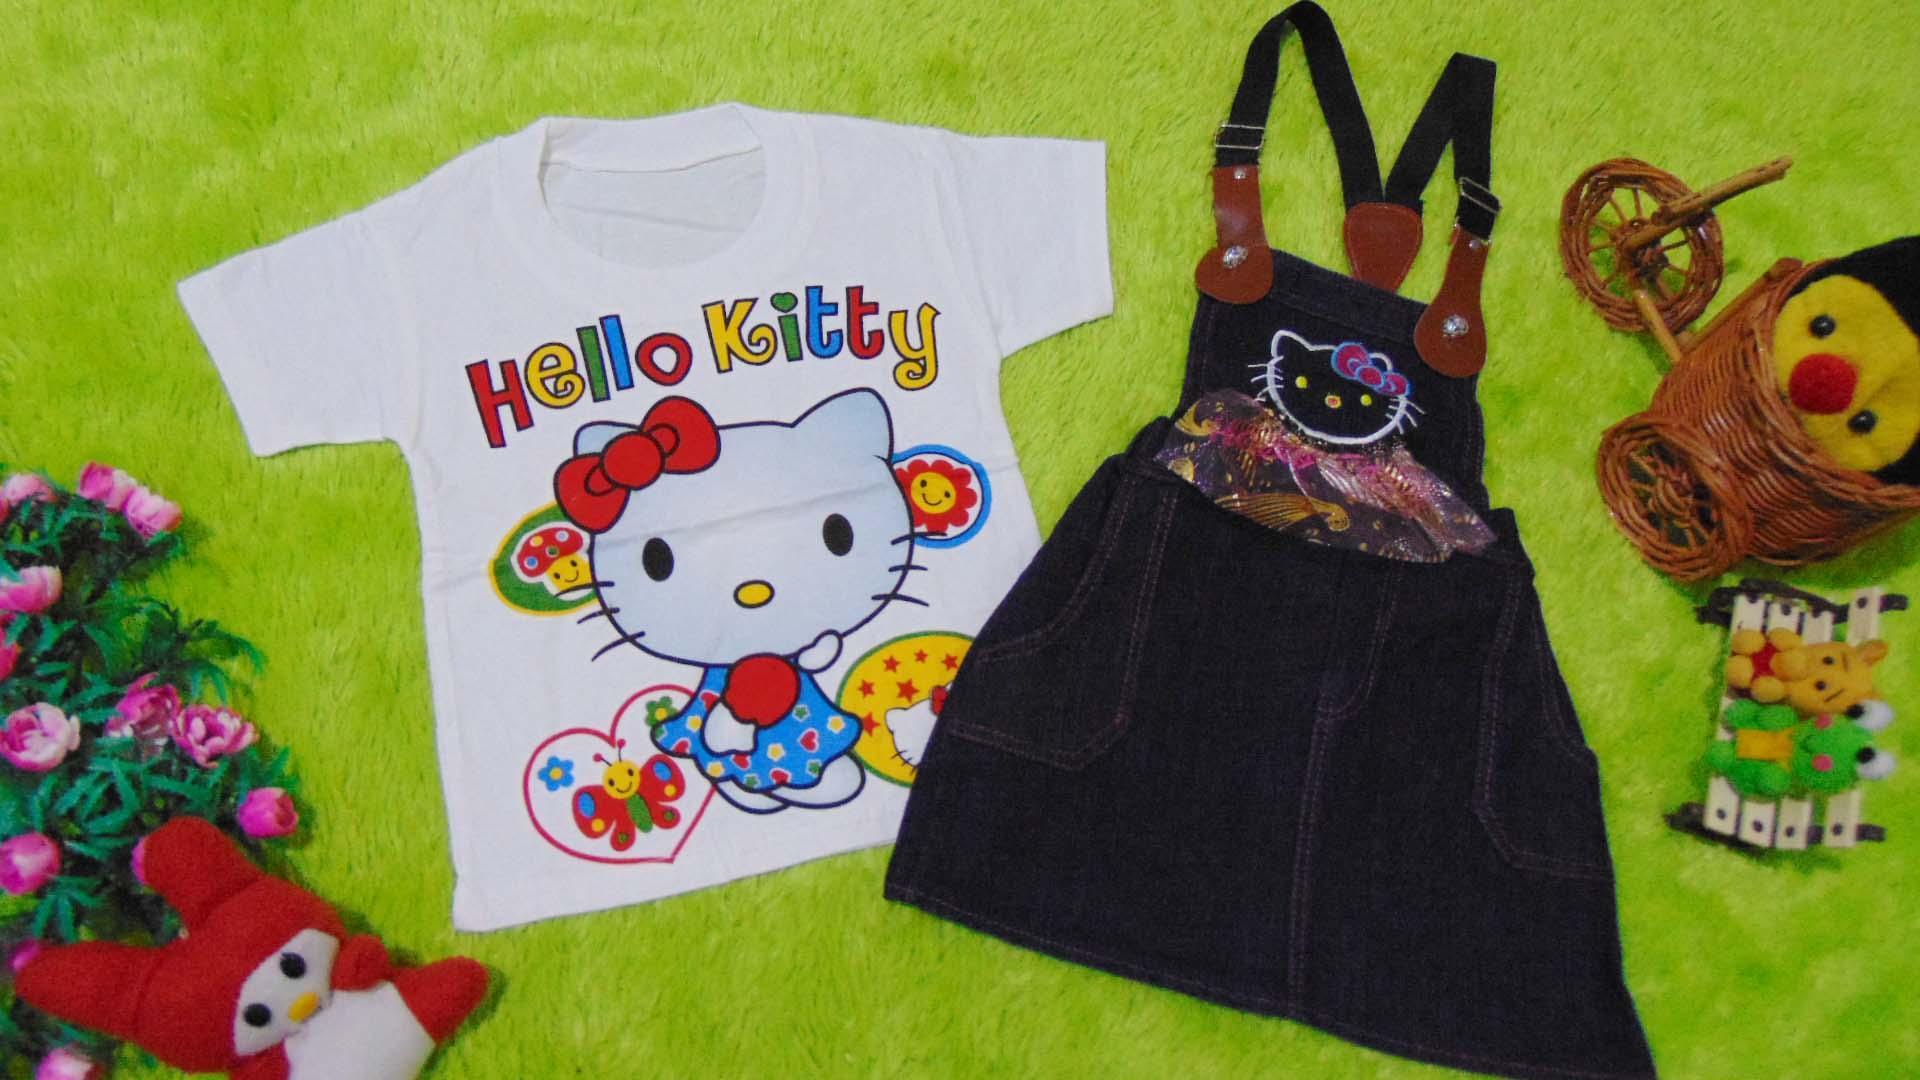 kembarshop - TERLARIS baju pesta bayi perempuan 0-12bulan setelan kaos plus rok kodok jeans hello kitty suspender tali gesper